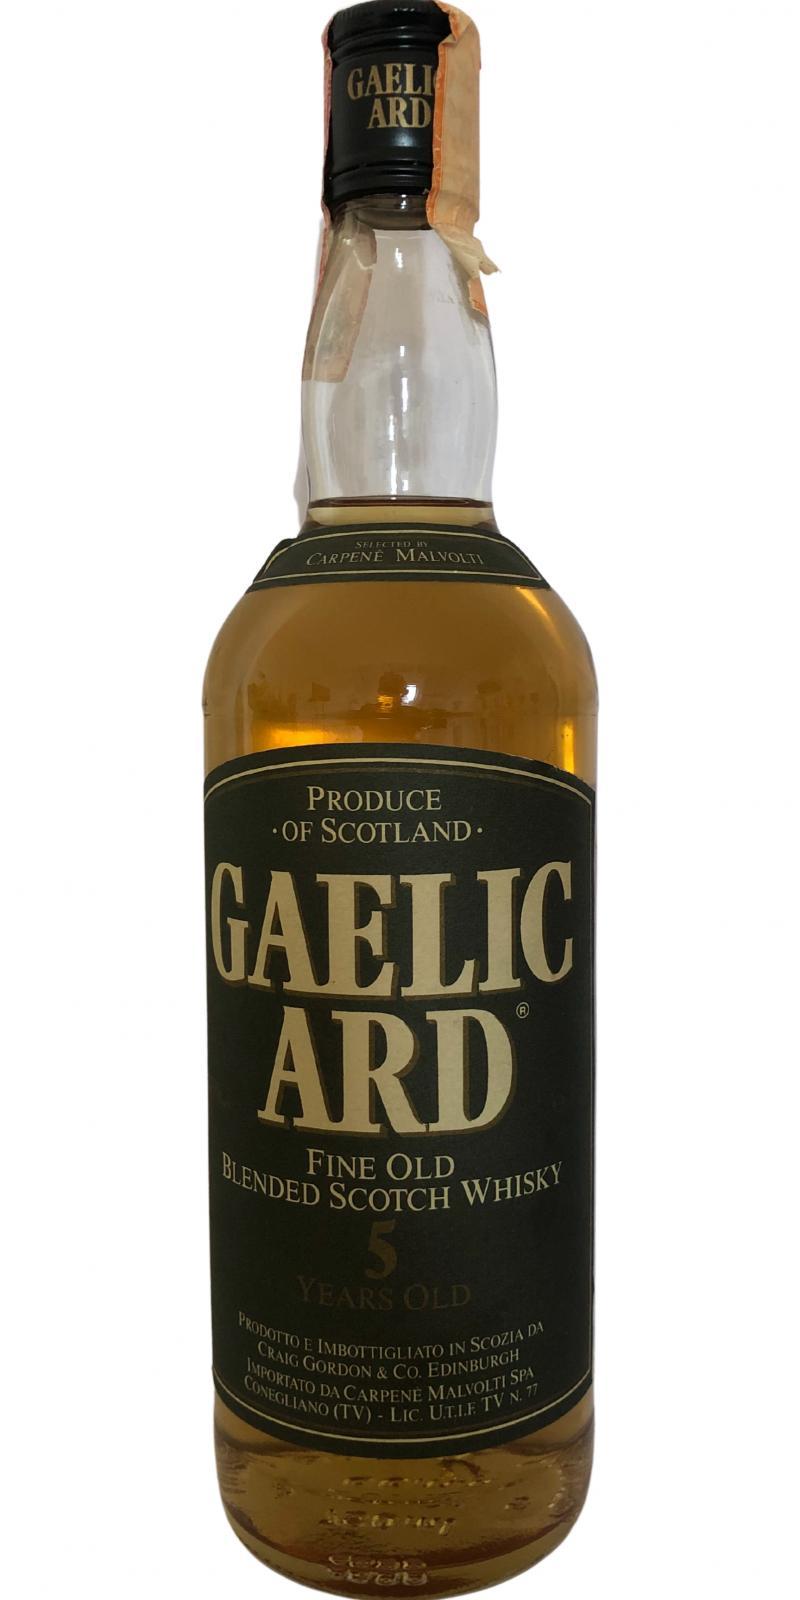 Gaelic Ard 05-year-old